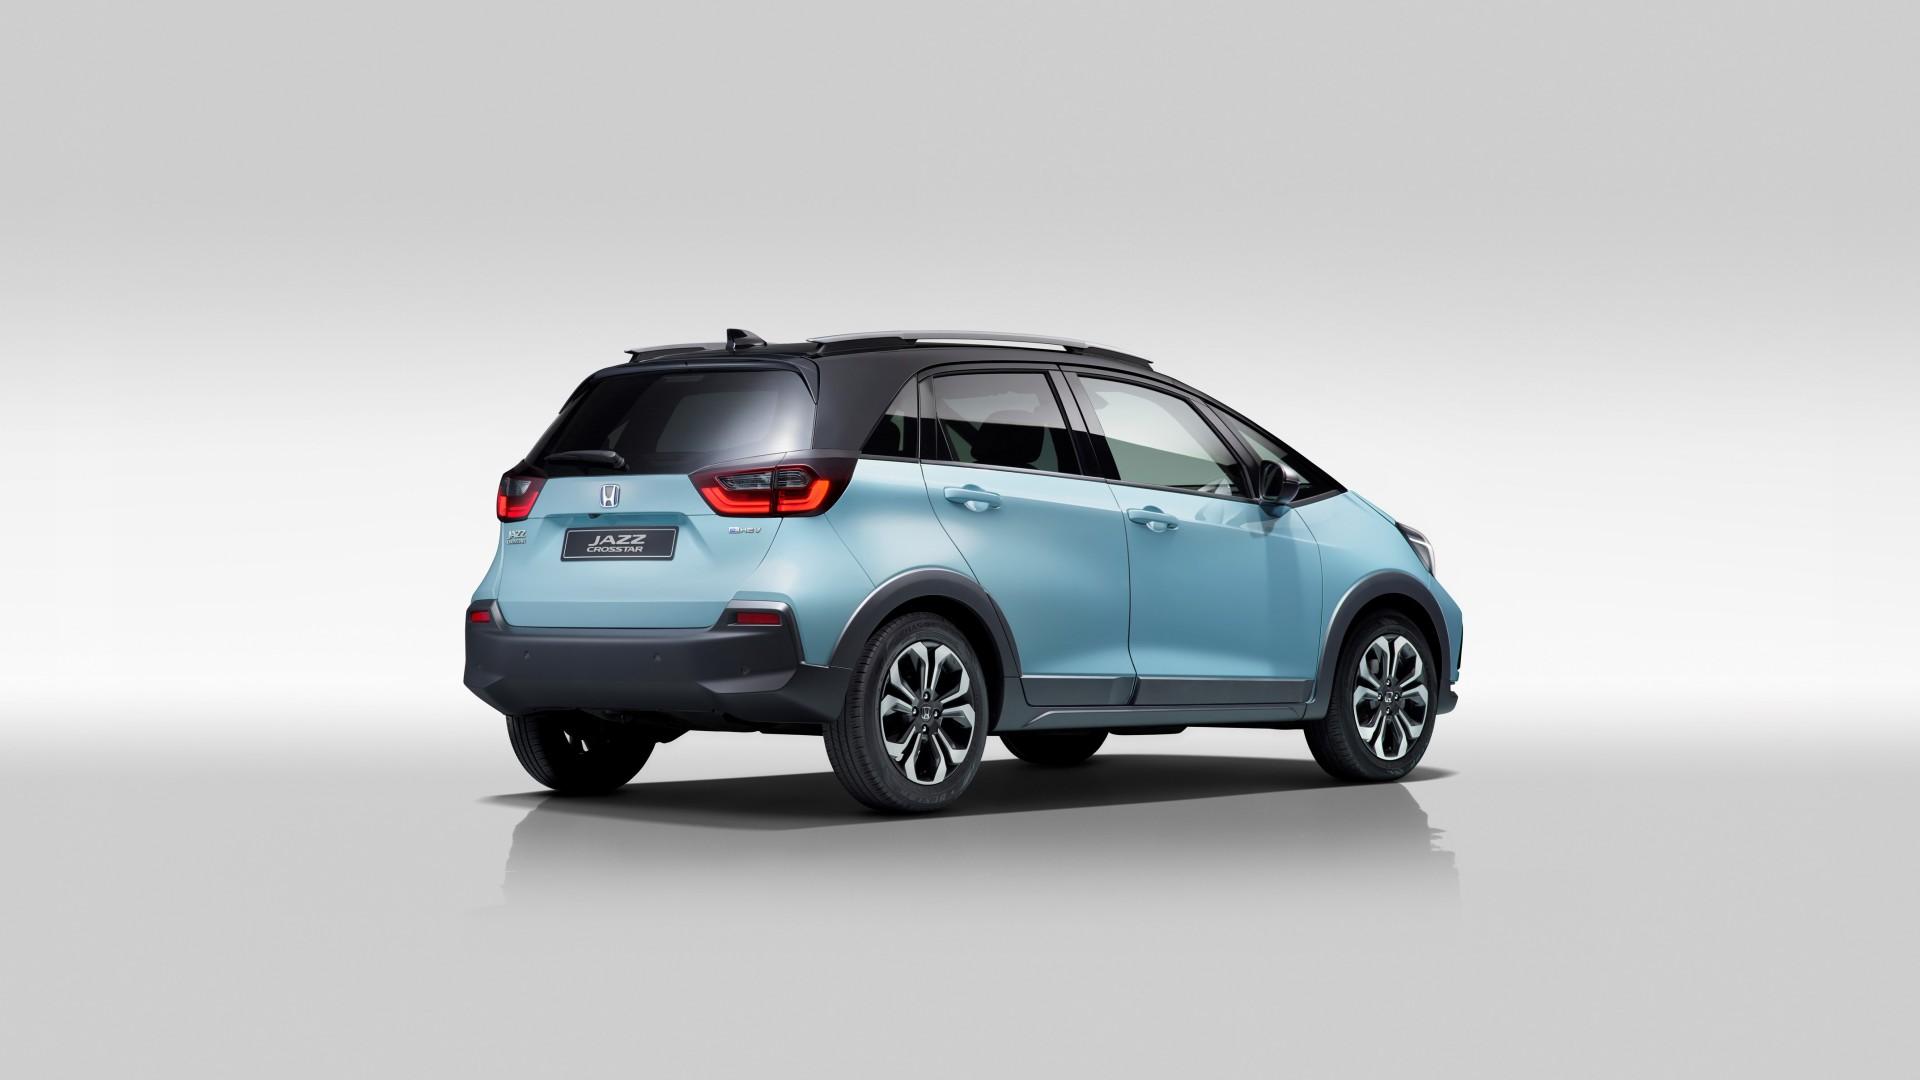 Honda Jazz 2020 Exterior (11)